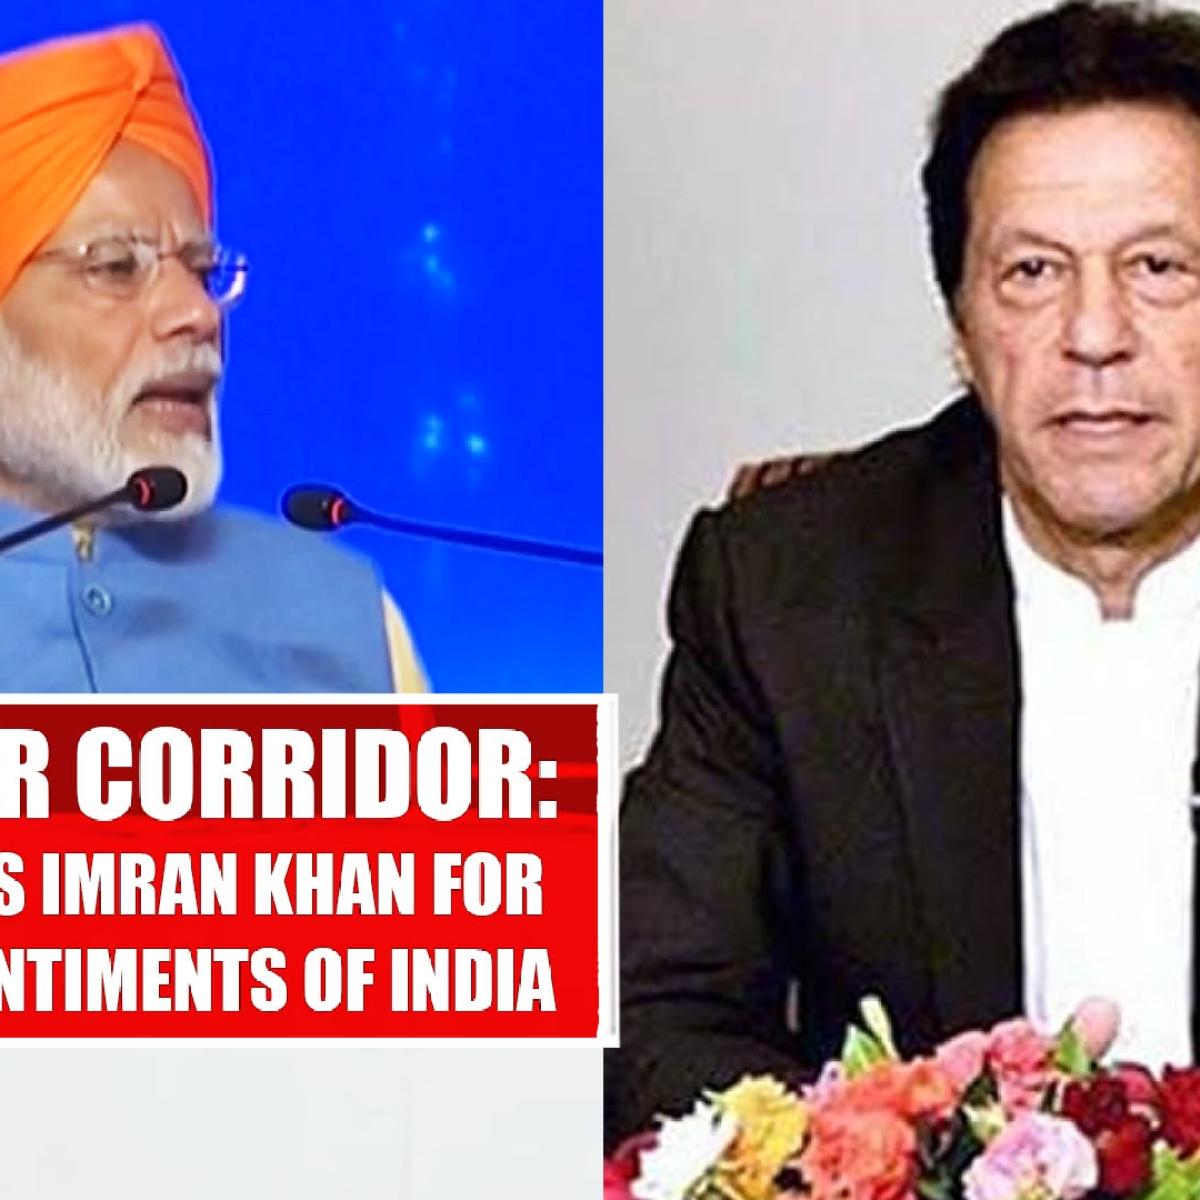 Kartarpur Corridor: PM Modi Thanks Imran Khan For Respecting Sentiments Of India